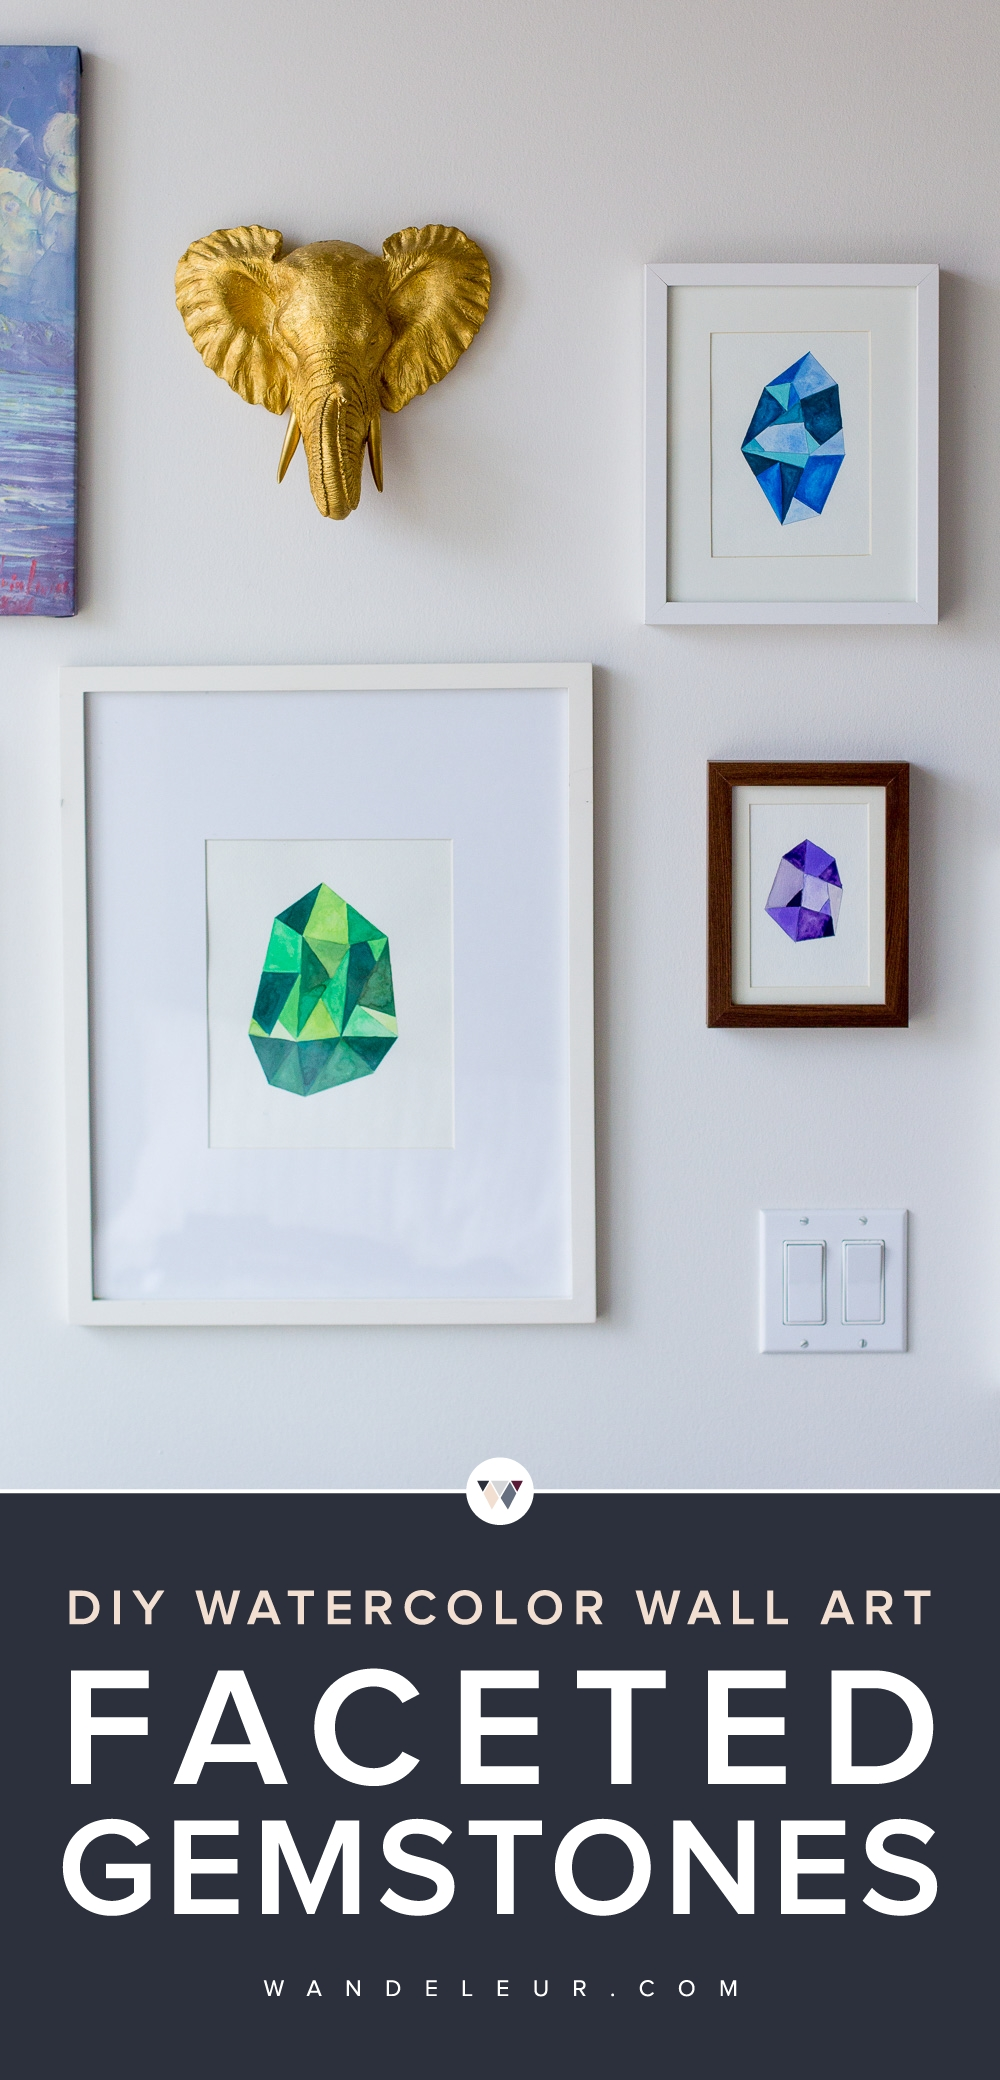 Diy Faceted Gemstone Wall Art — Wandeleur With Regard To Gemstone Wall Art (Image 9 of 20)